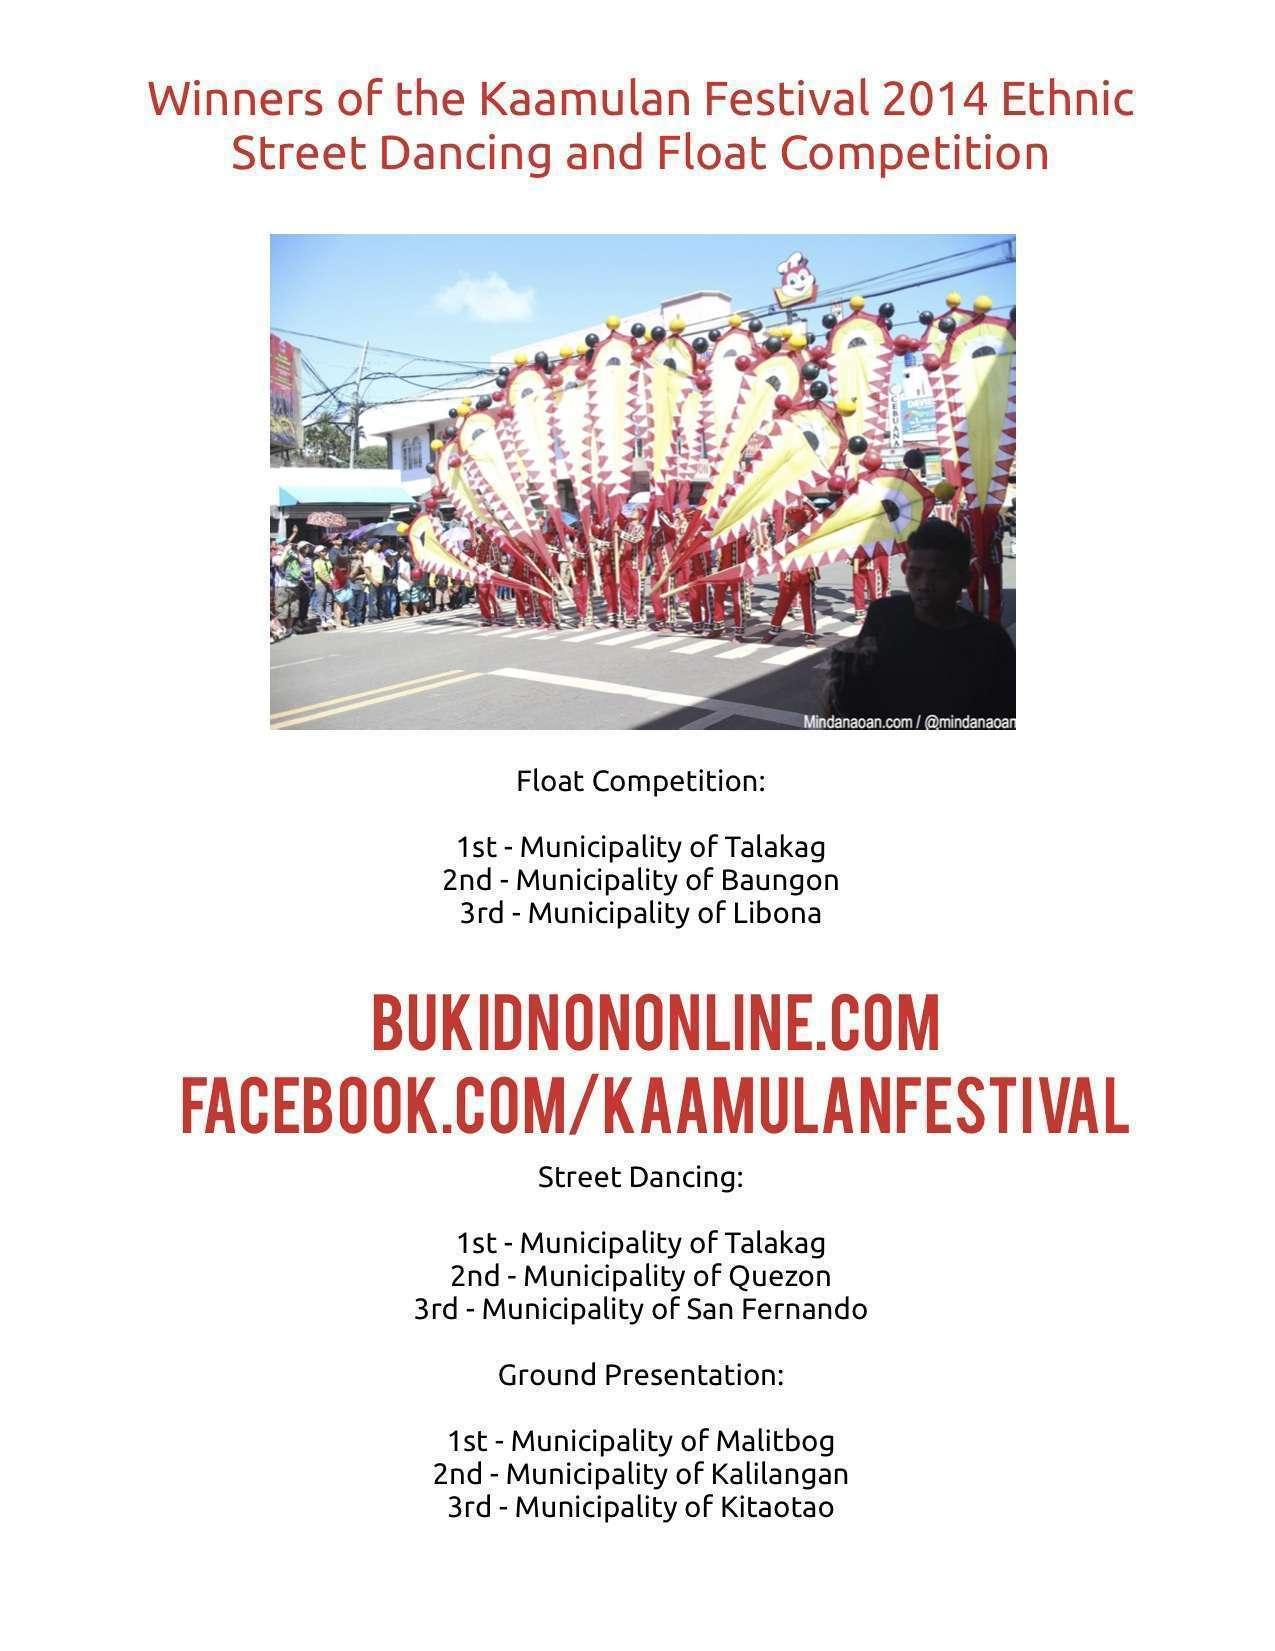 kaamulan2014-street-dancing-results